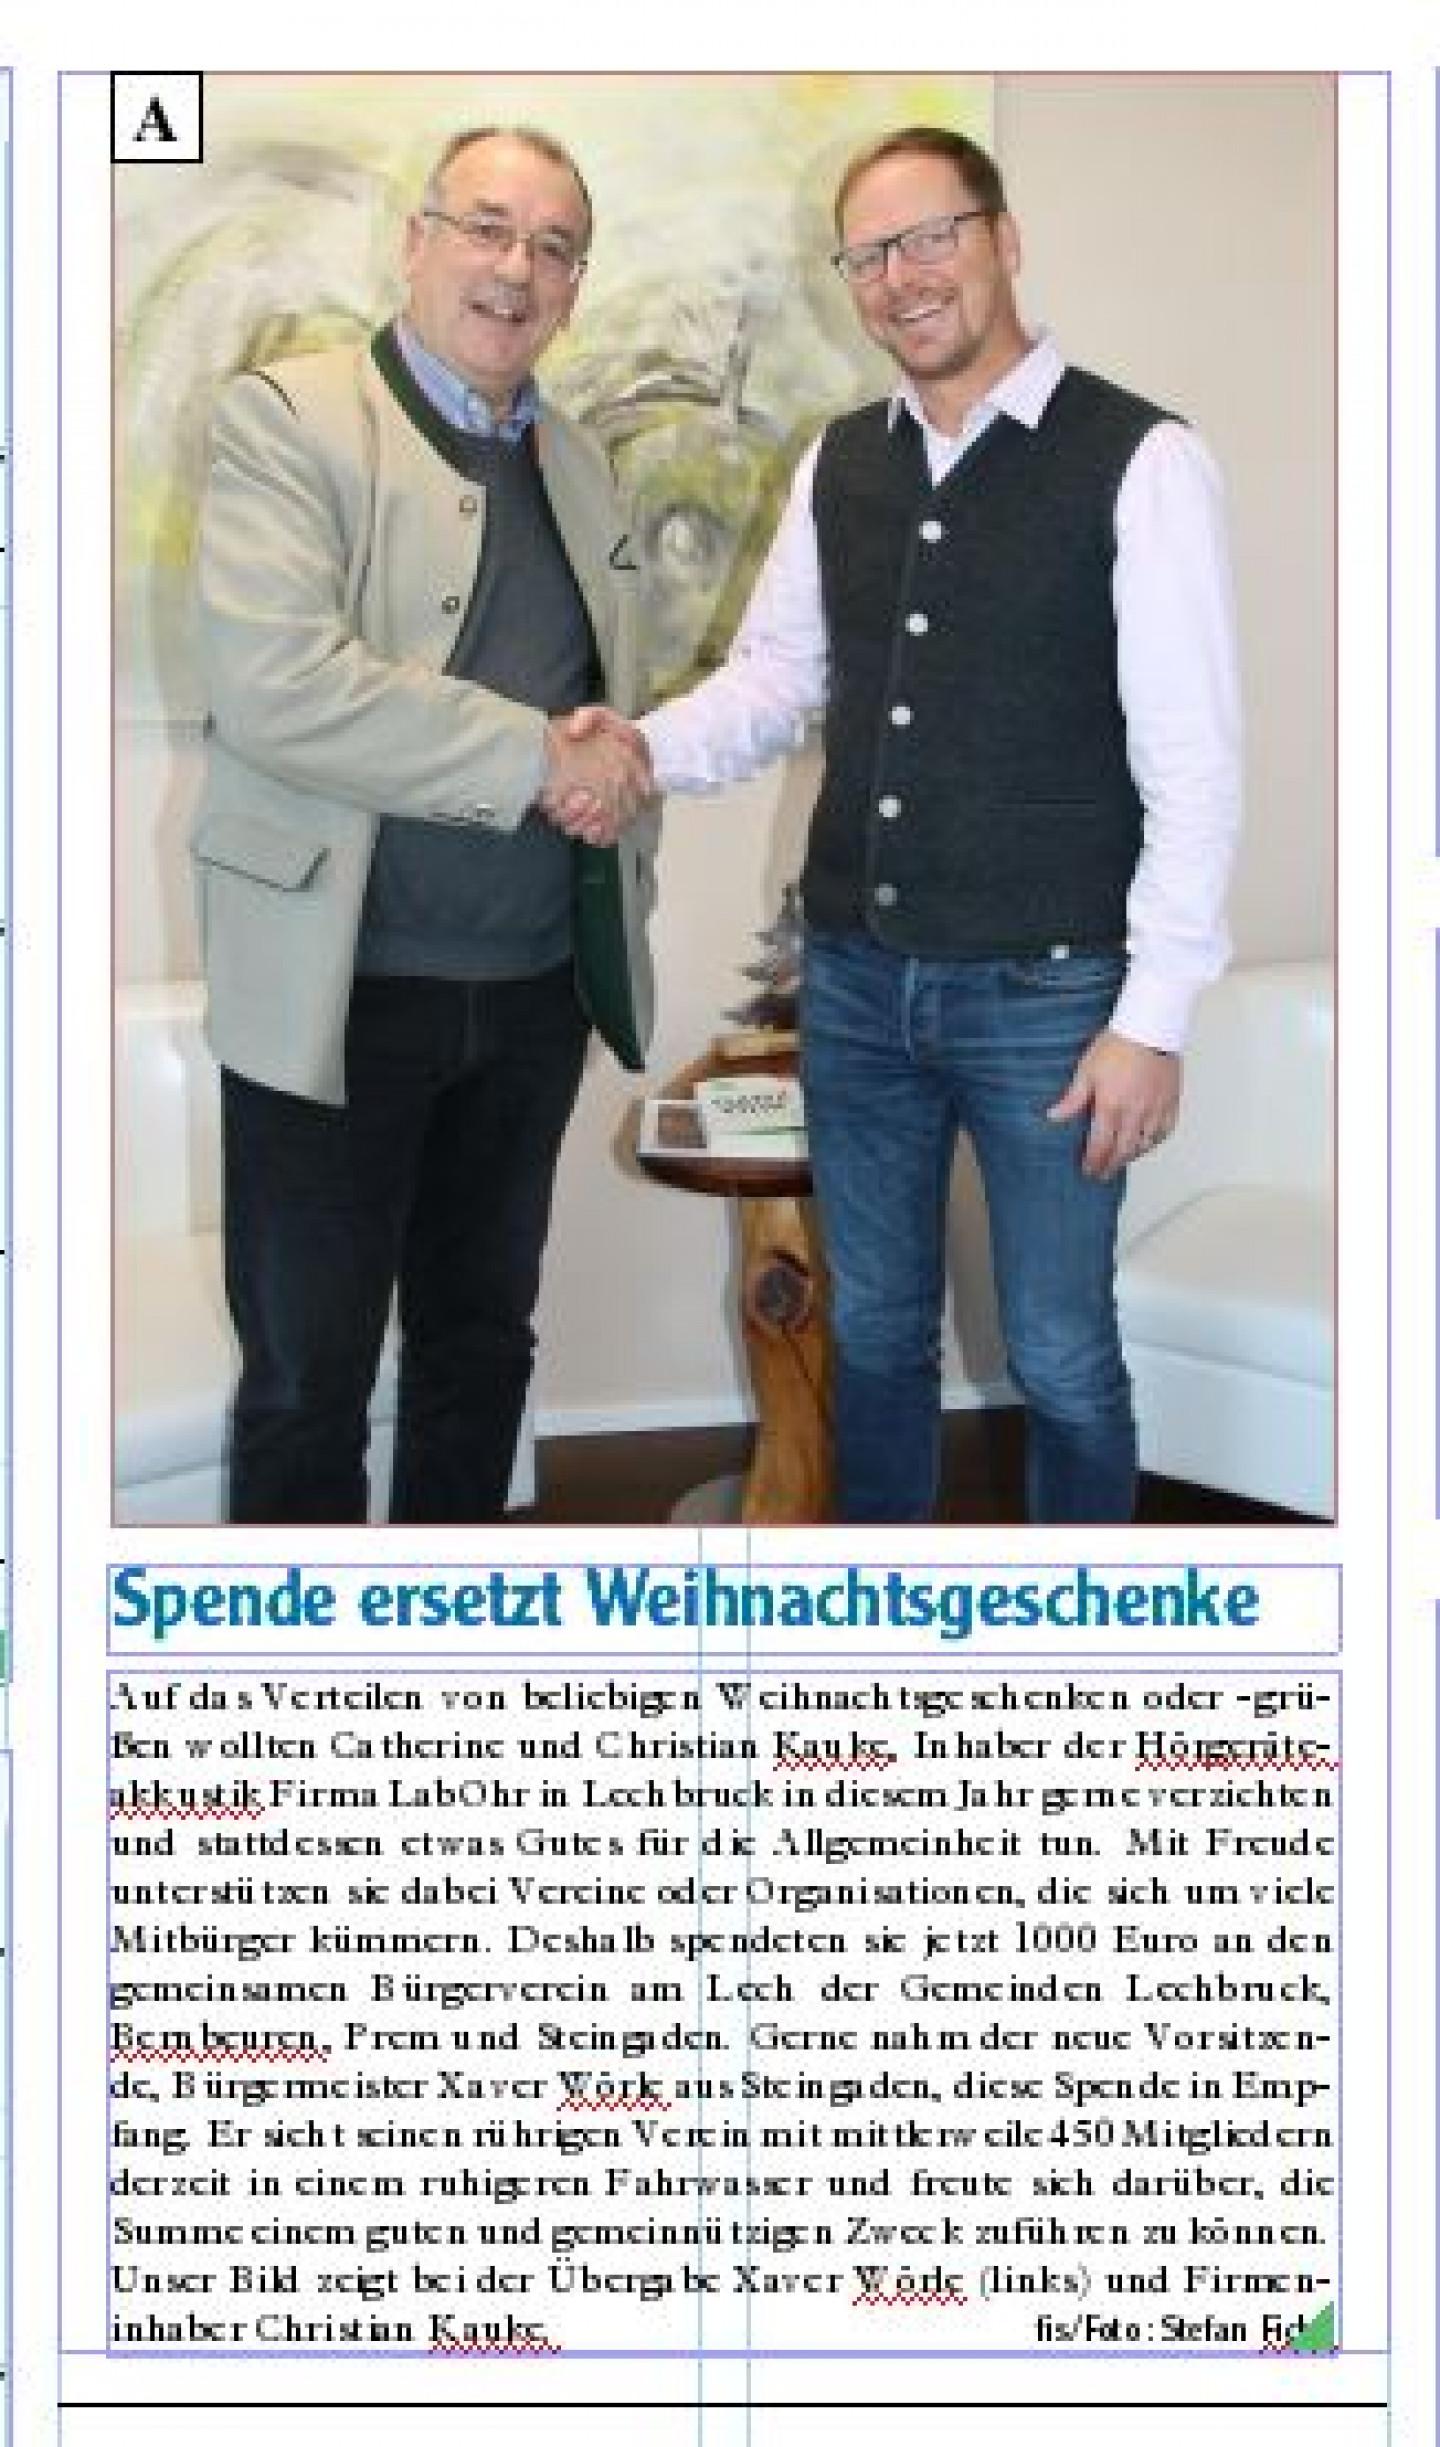 Spende-Bürgerverein-Lechbruck-Steingaden